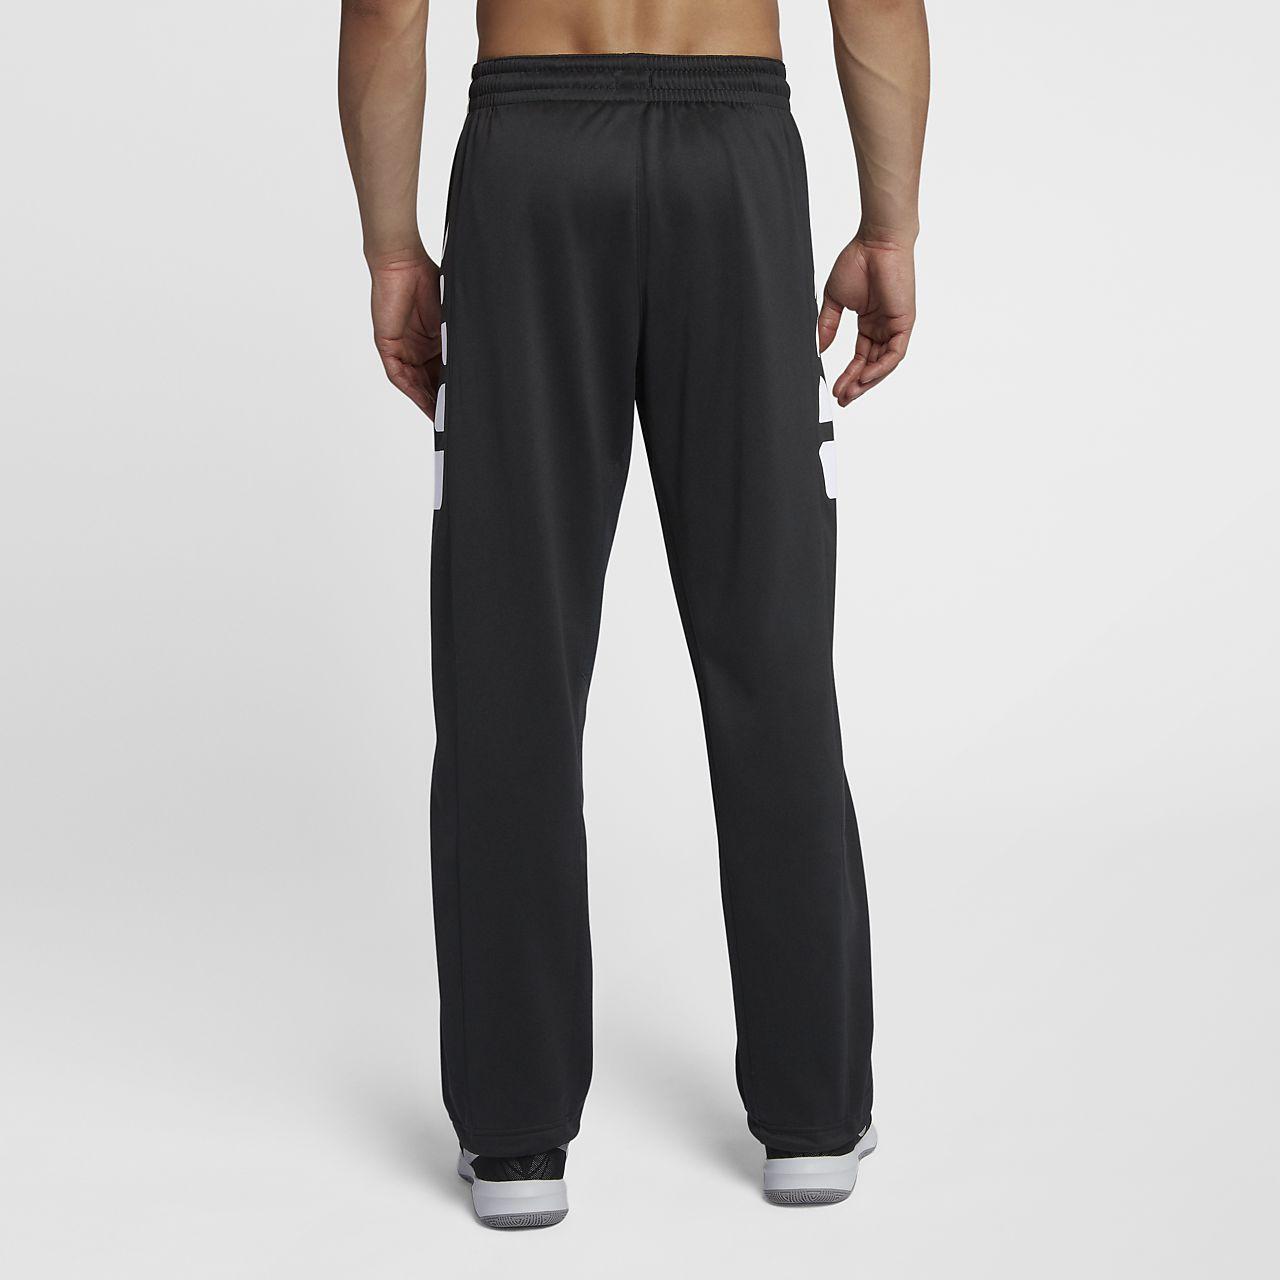 24080541a664 Nike Therma Elite Men s Basketball Pants. Nike.com